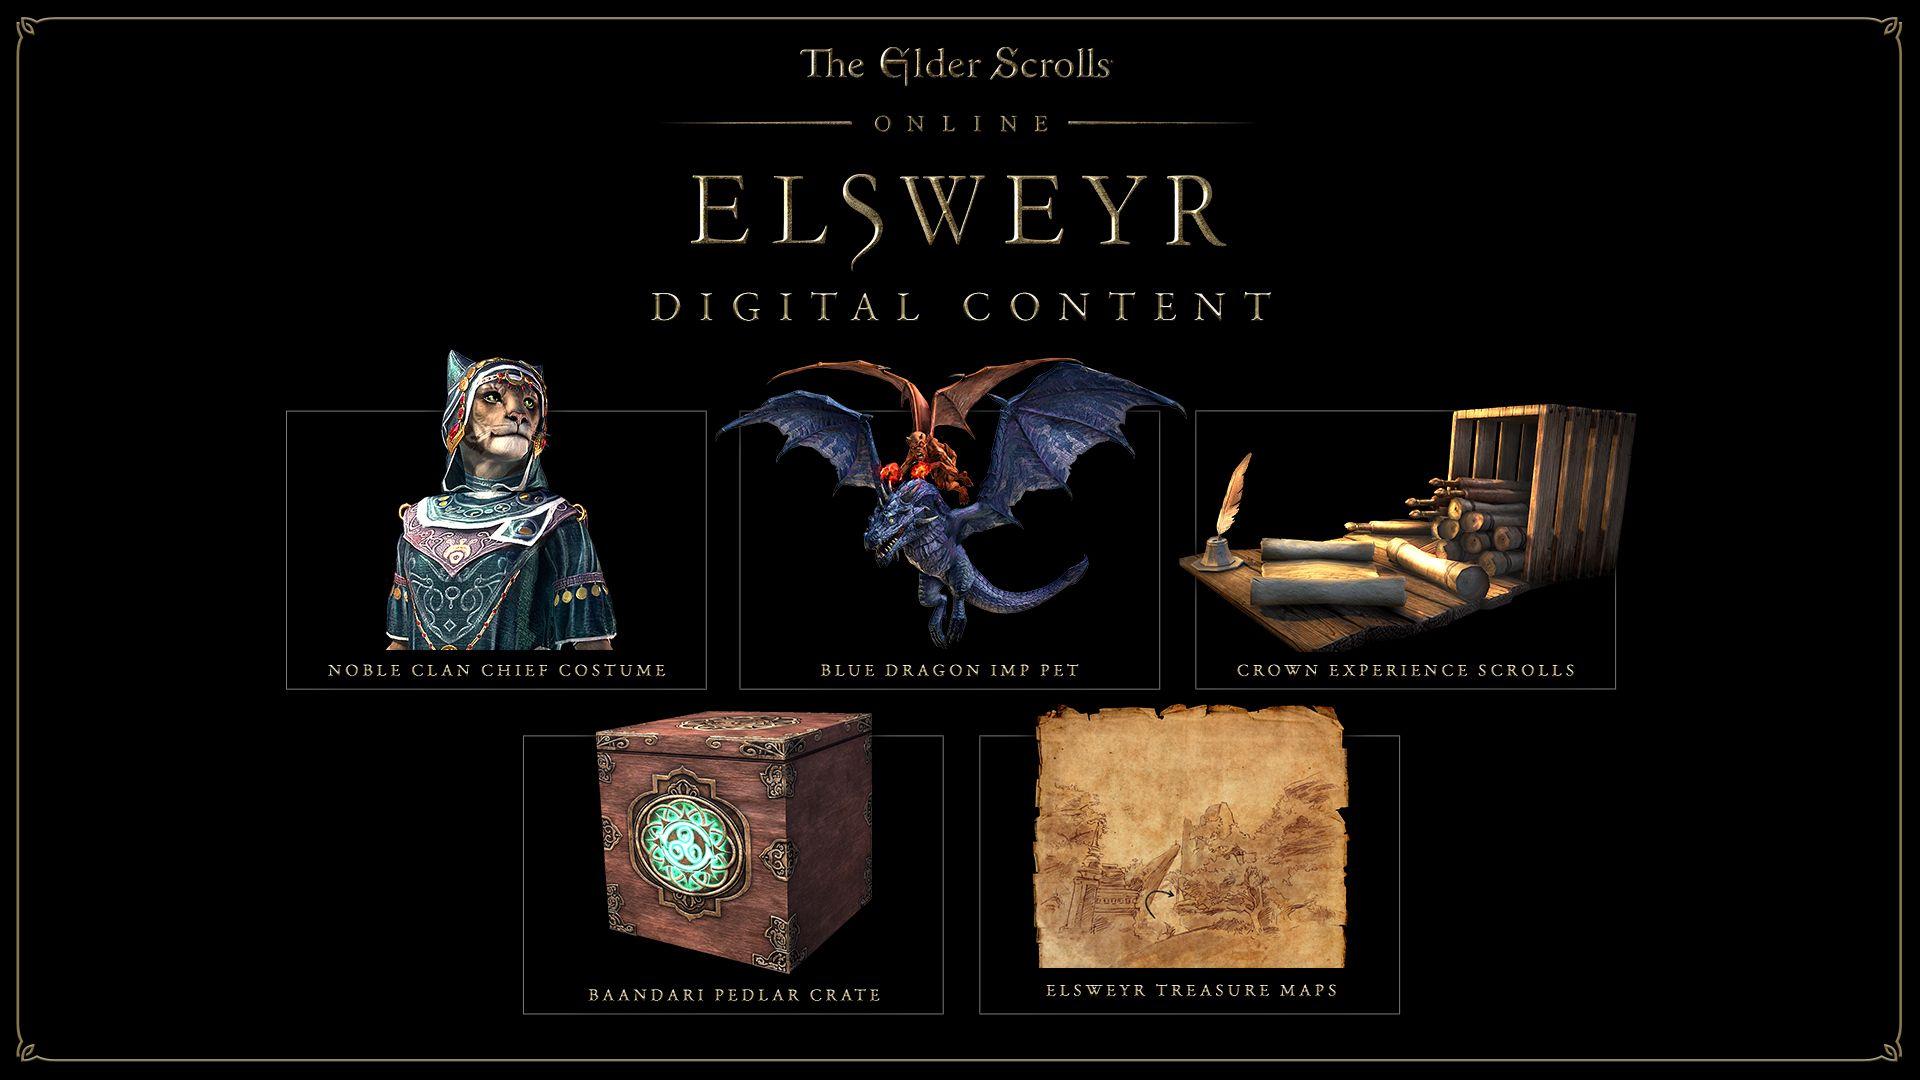 THE ELDER SCROLLS ONLINE: ELSWEYR UPGRADE | REGION FREE